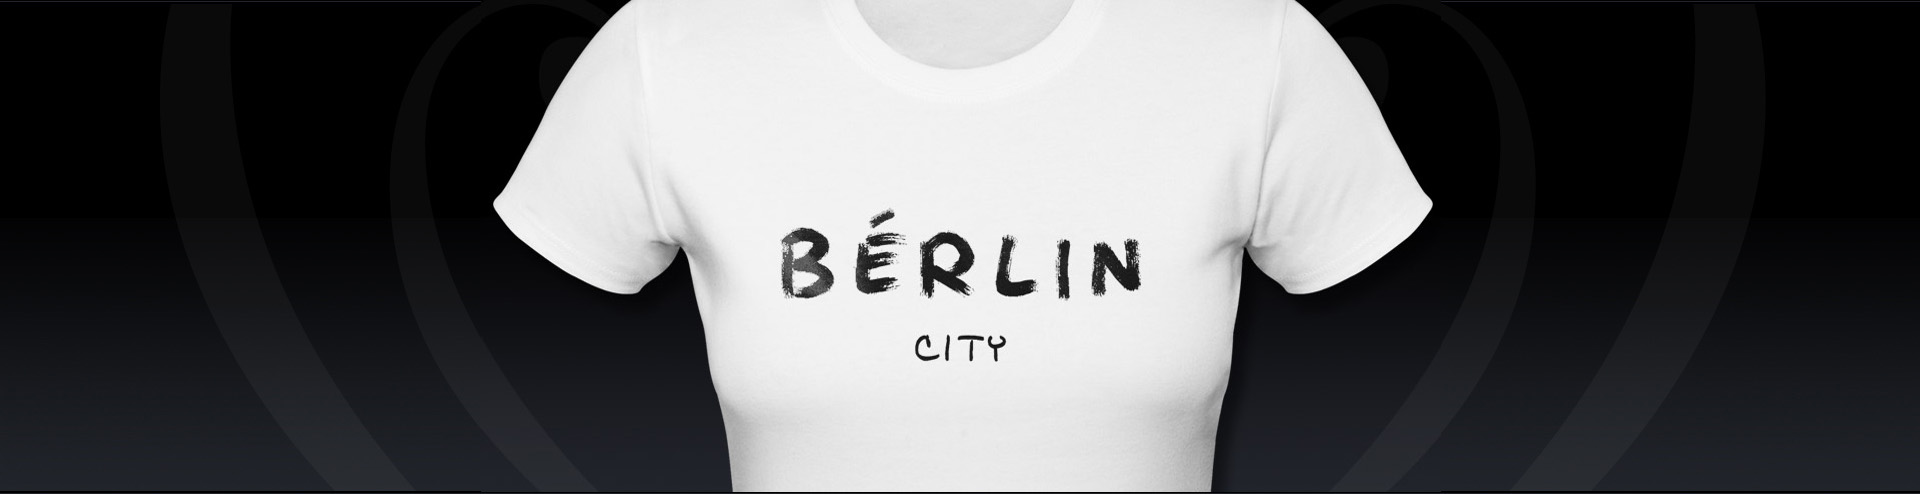 T-shirt Druck Stuttgart Motiv Berlin